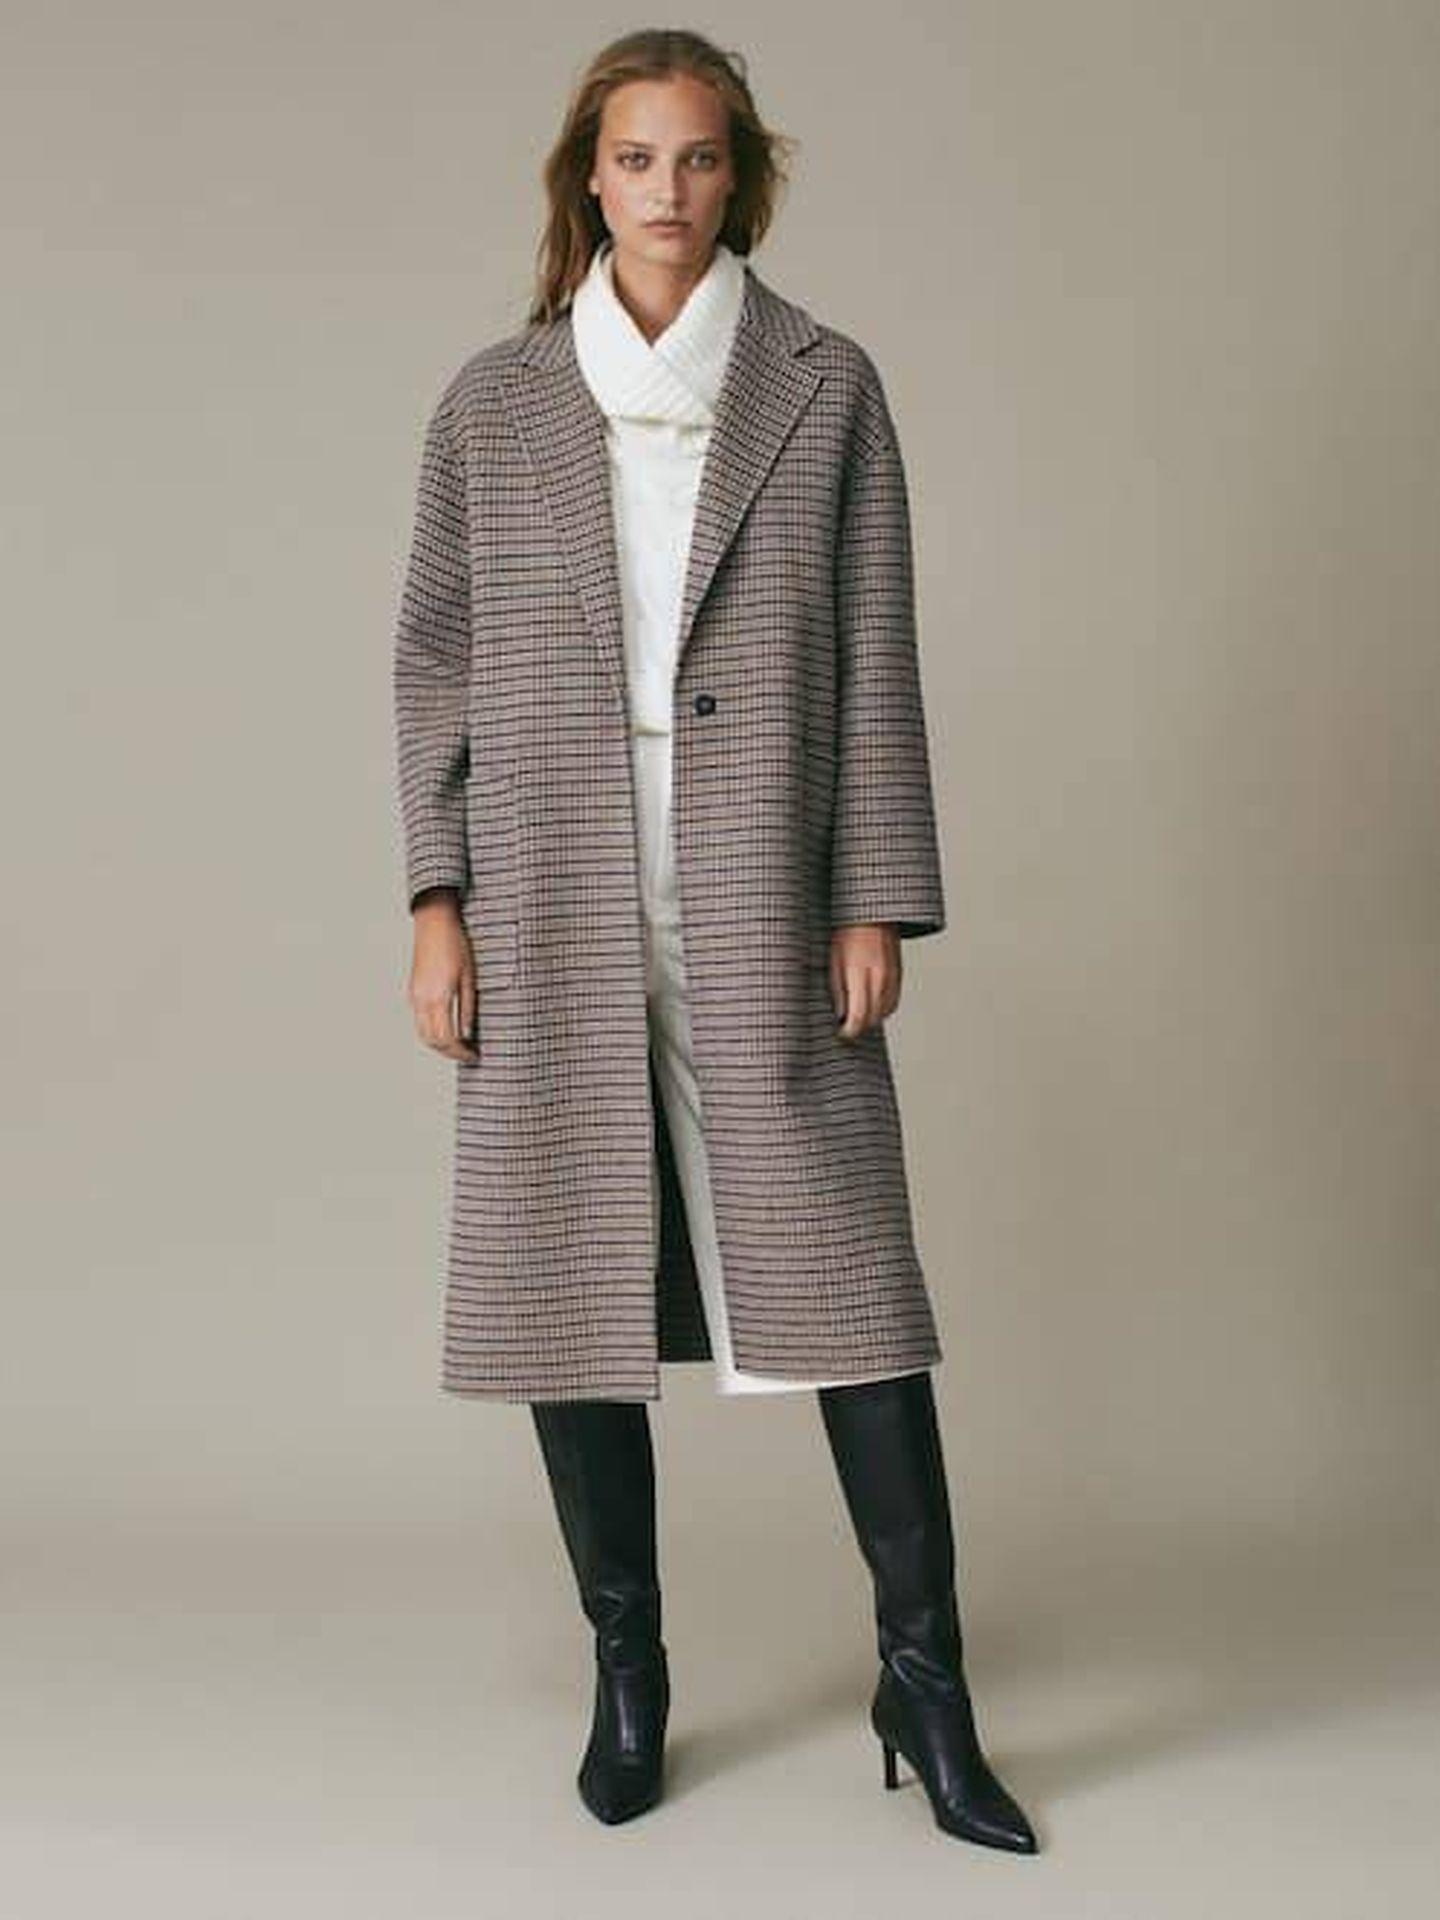 El abrigo de Massimo Dutti que tiene Kate Middleton. (Cortesía)